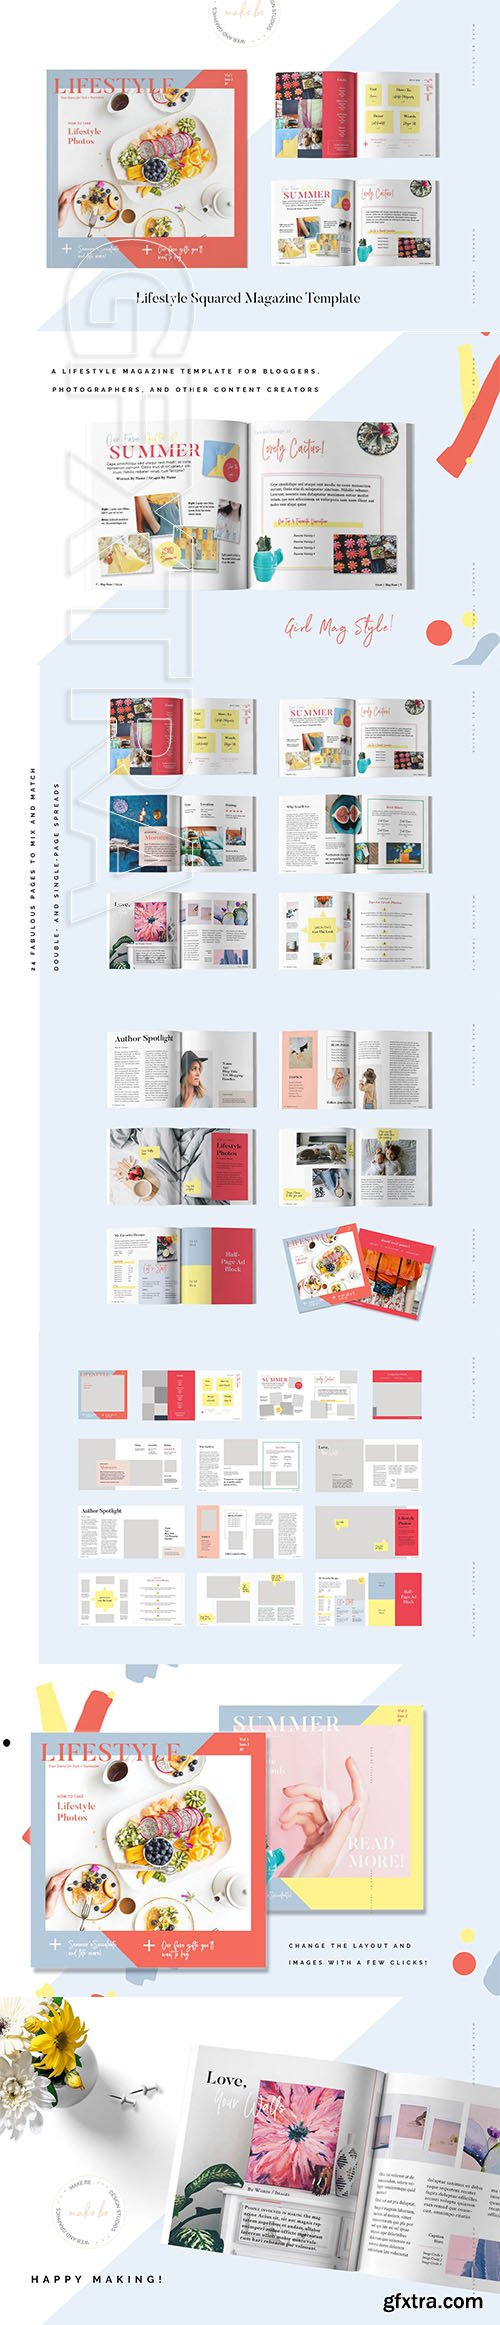 CreativeMarket - Lifestyle Squared Magazine Template 3166623